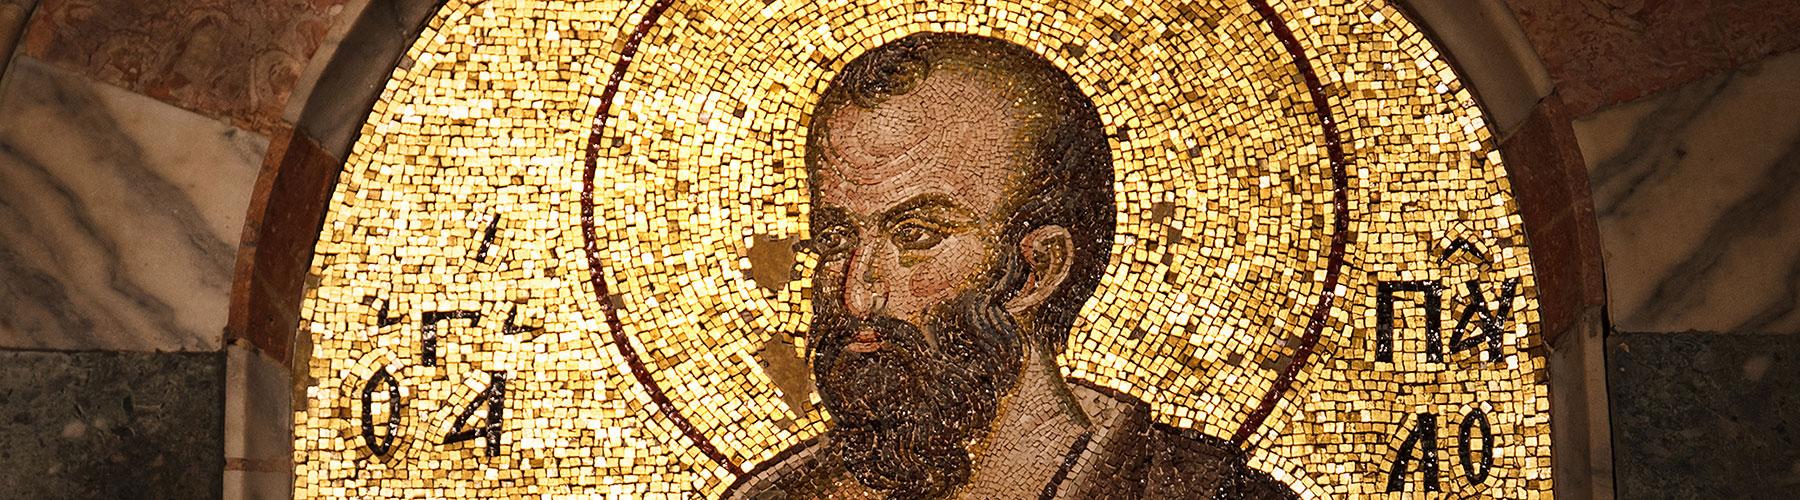 Župnijsko romanje: Grčija, po Pavlovih poteh